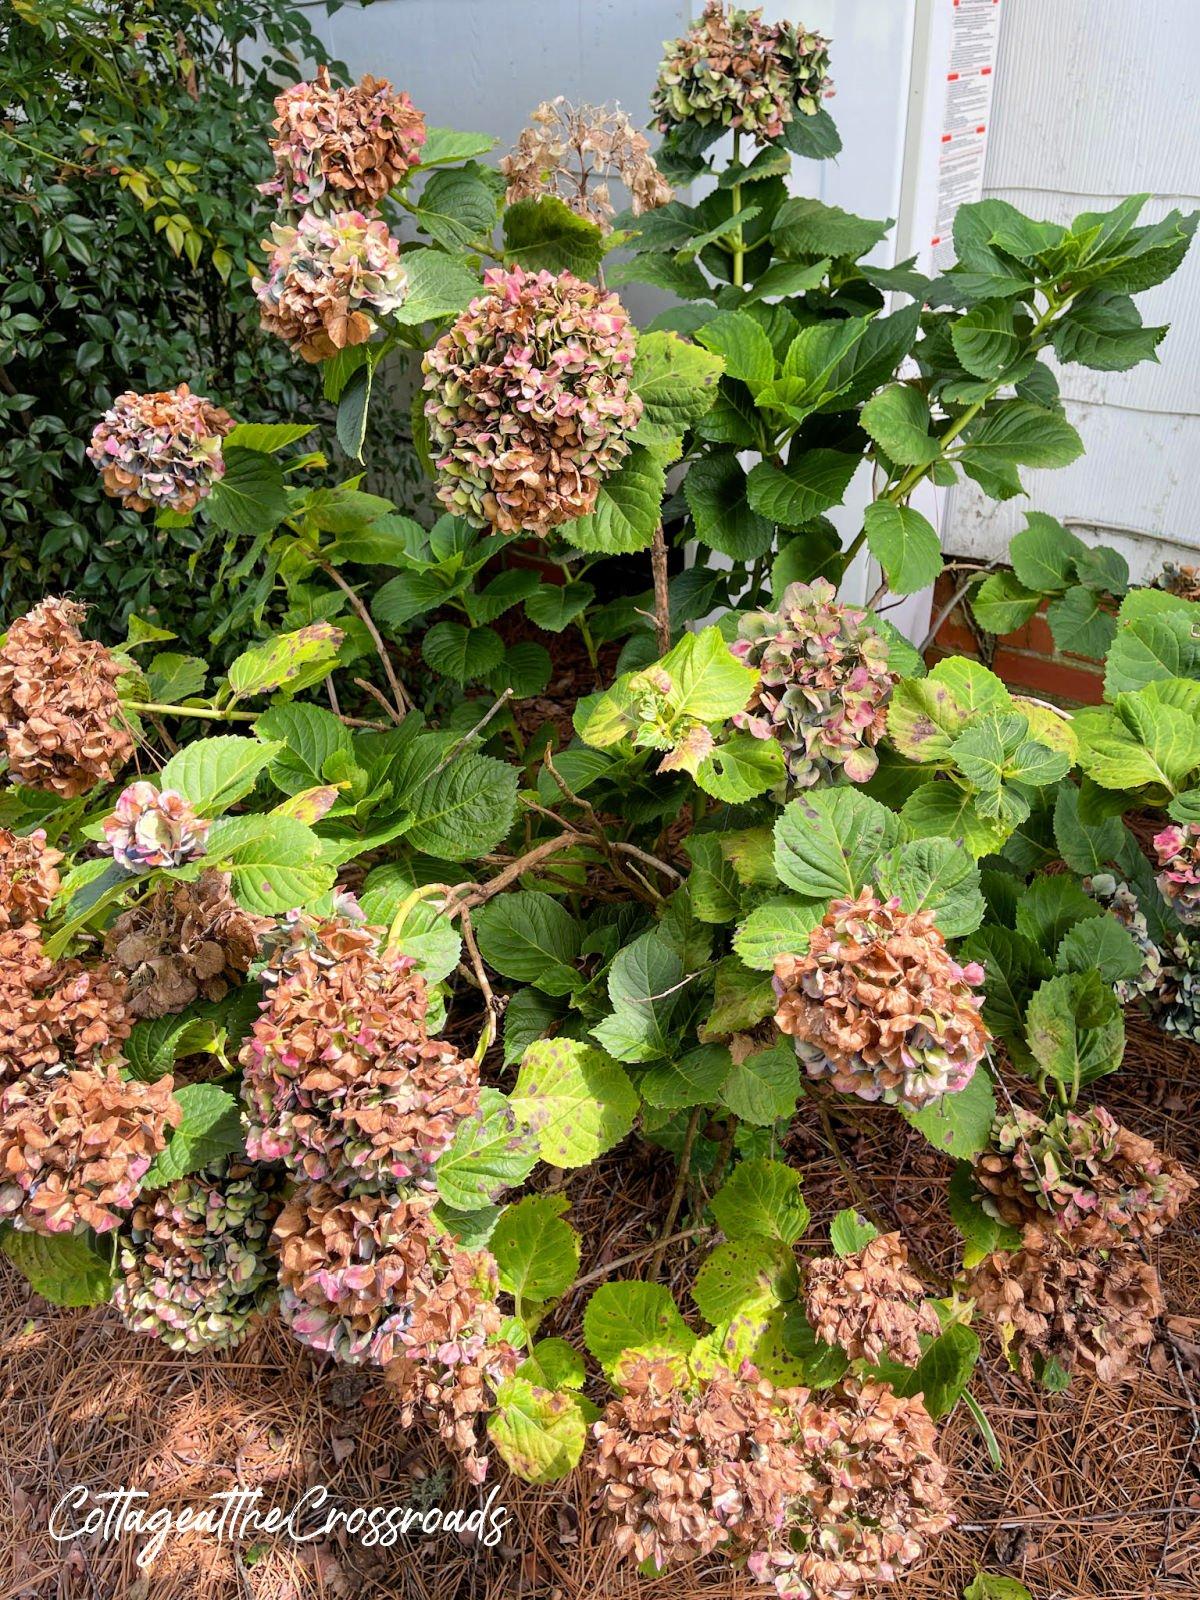 hydrangea blooms drying on a bush